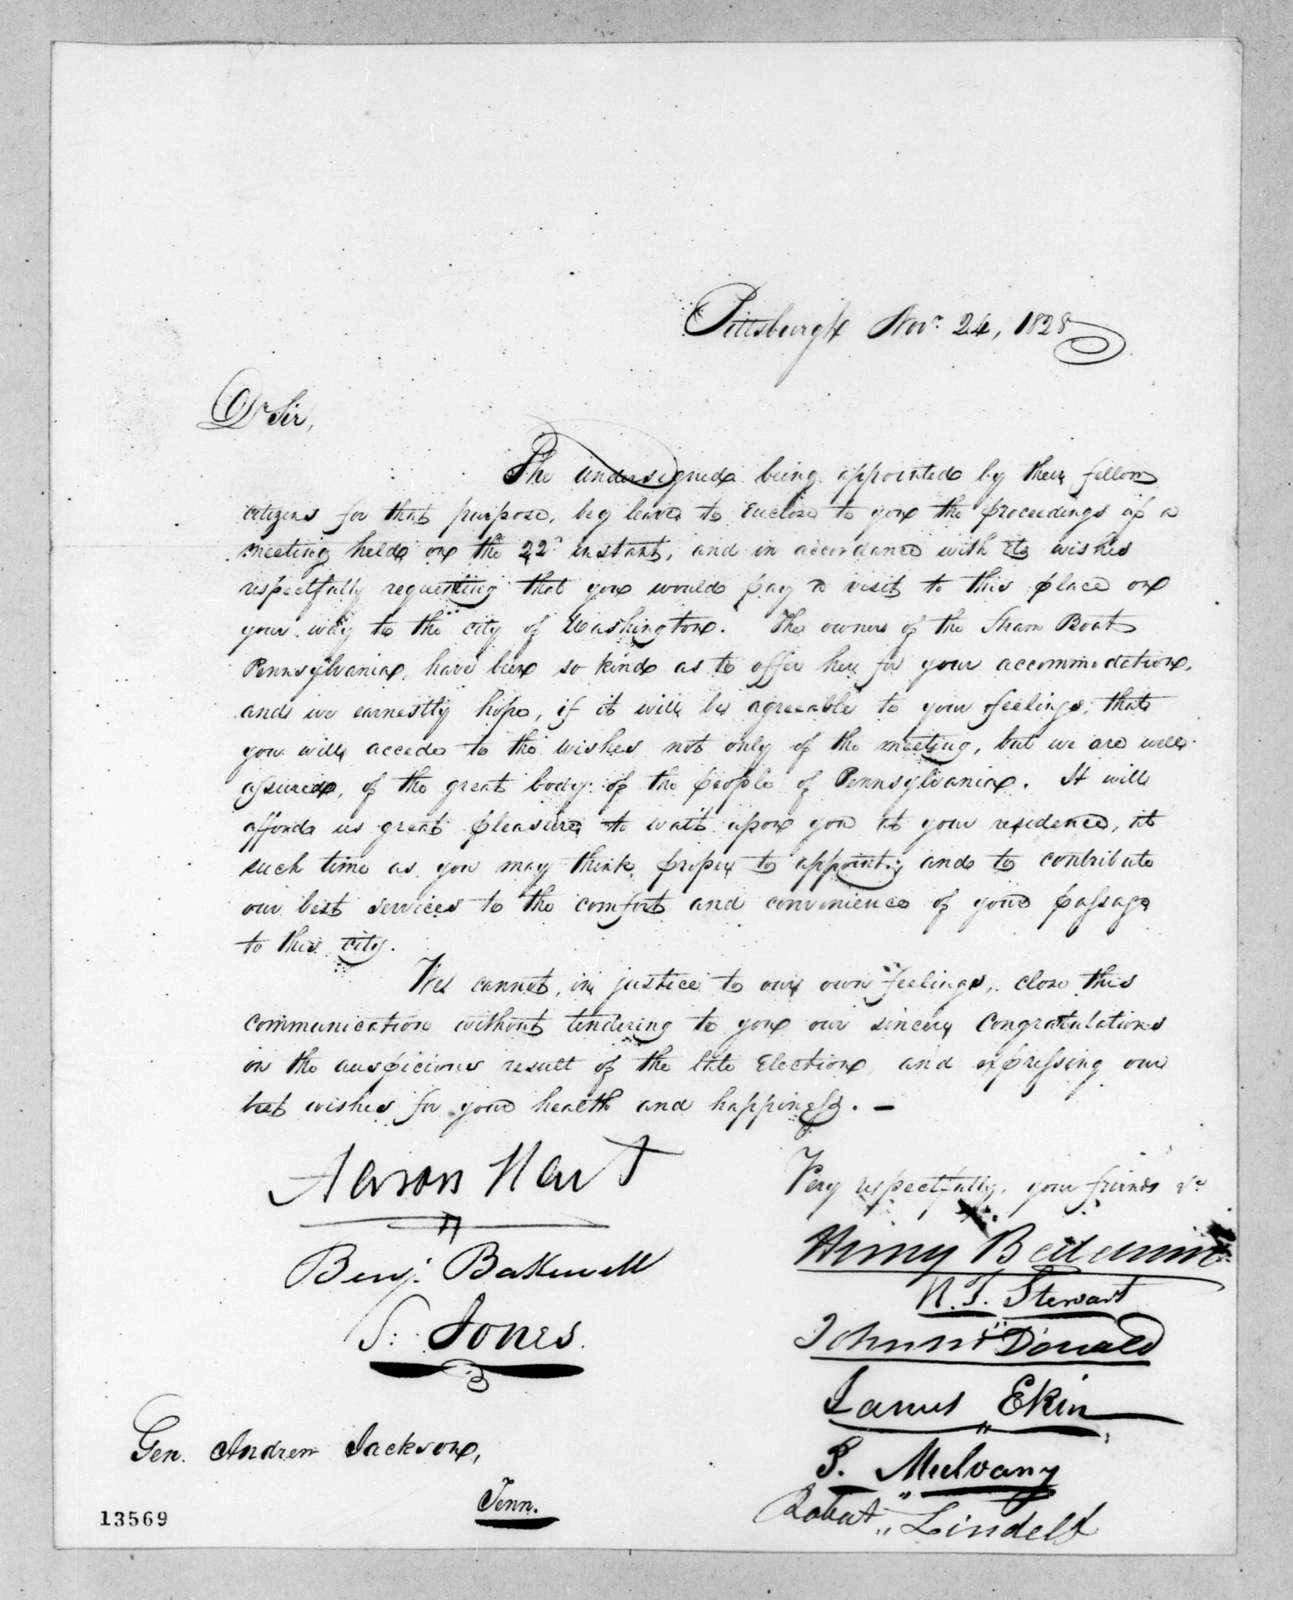 Henry Baldwin et al. to Andrew Jackson, November 24, 1828